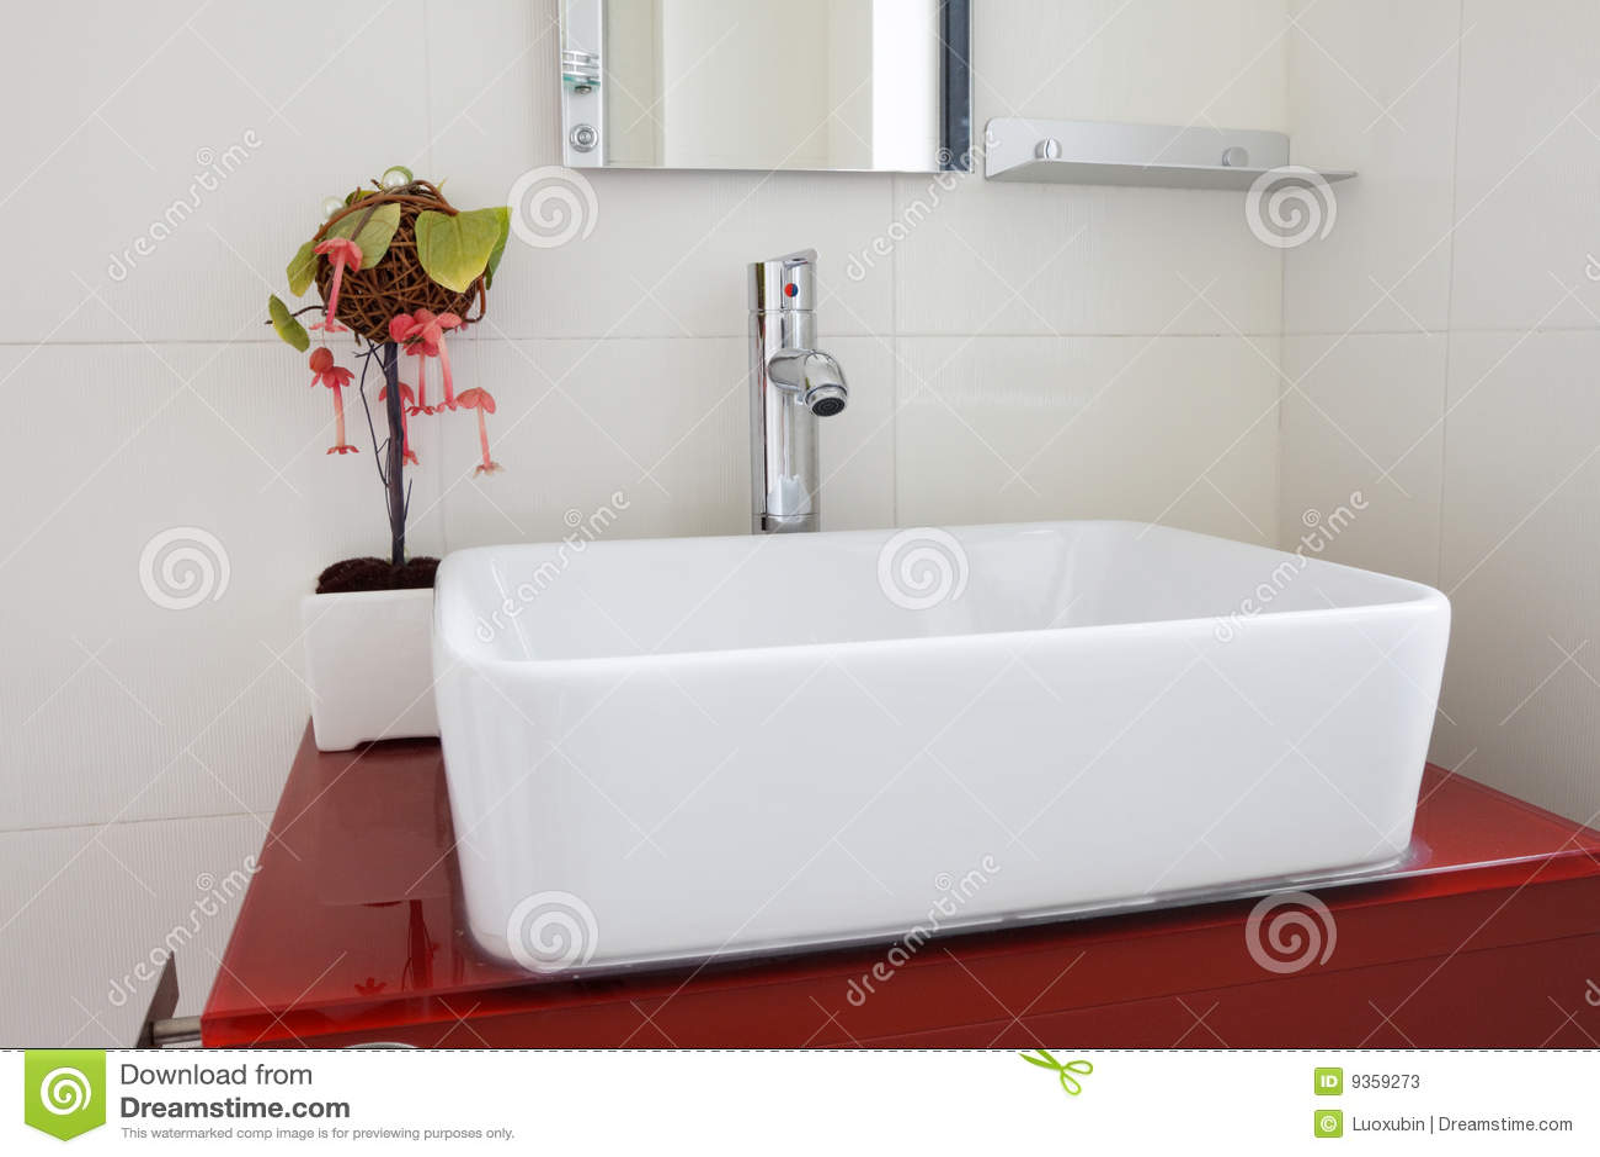 The modern washroom interior